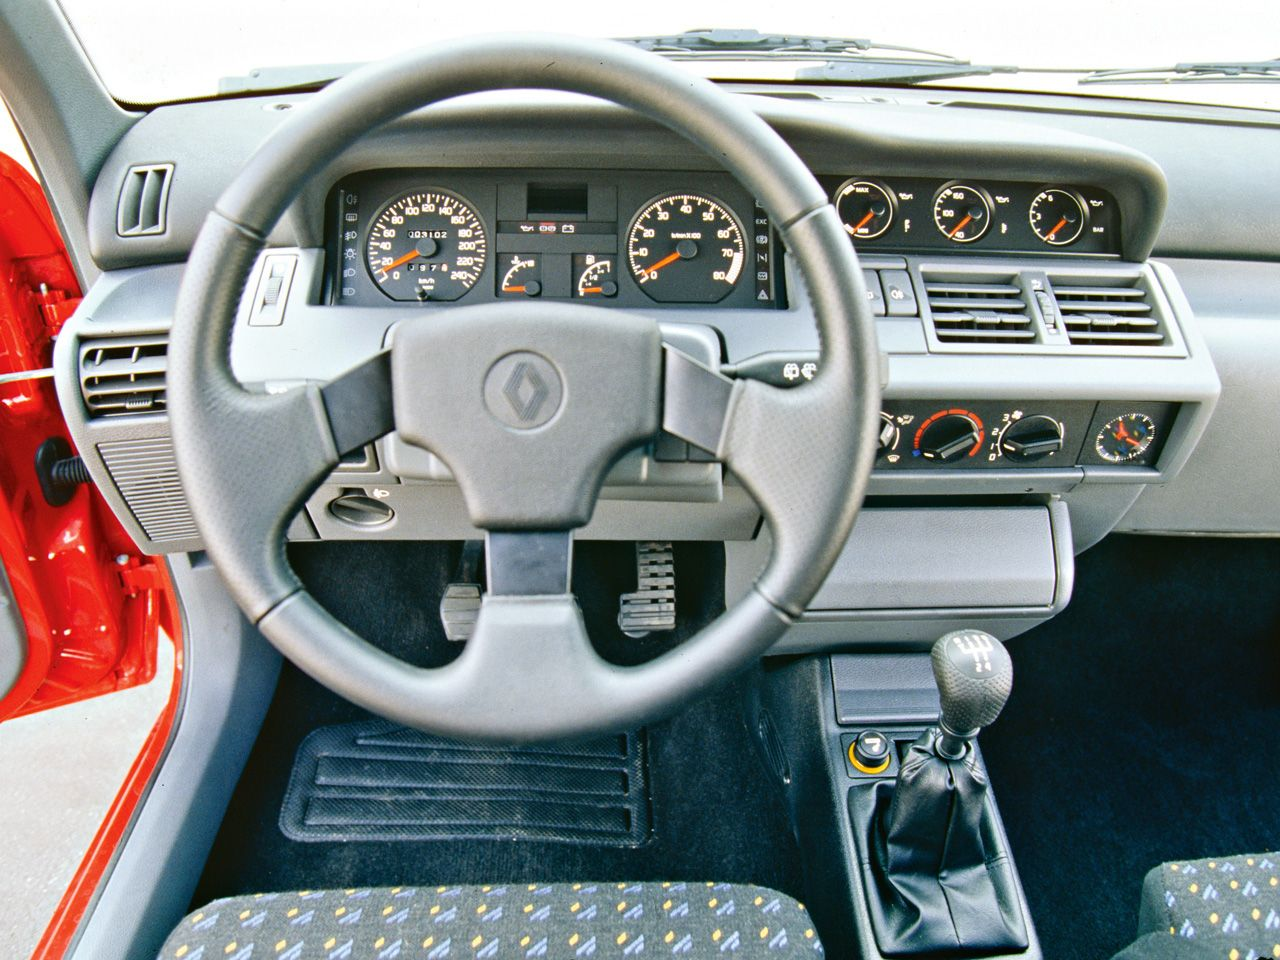 1991 Renault Clio Renault 5 Auto Motorizada